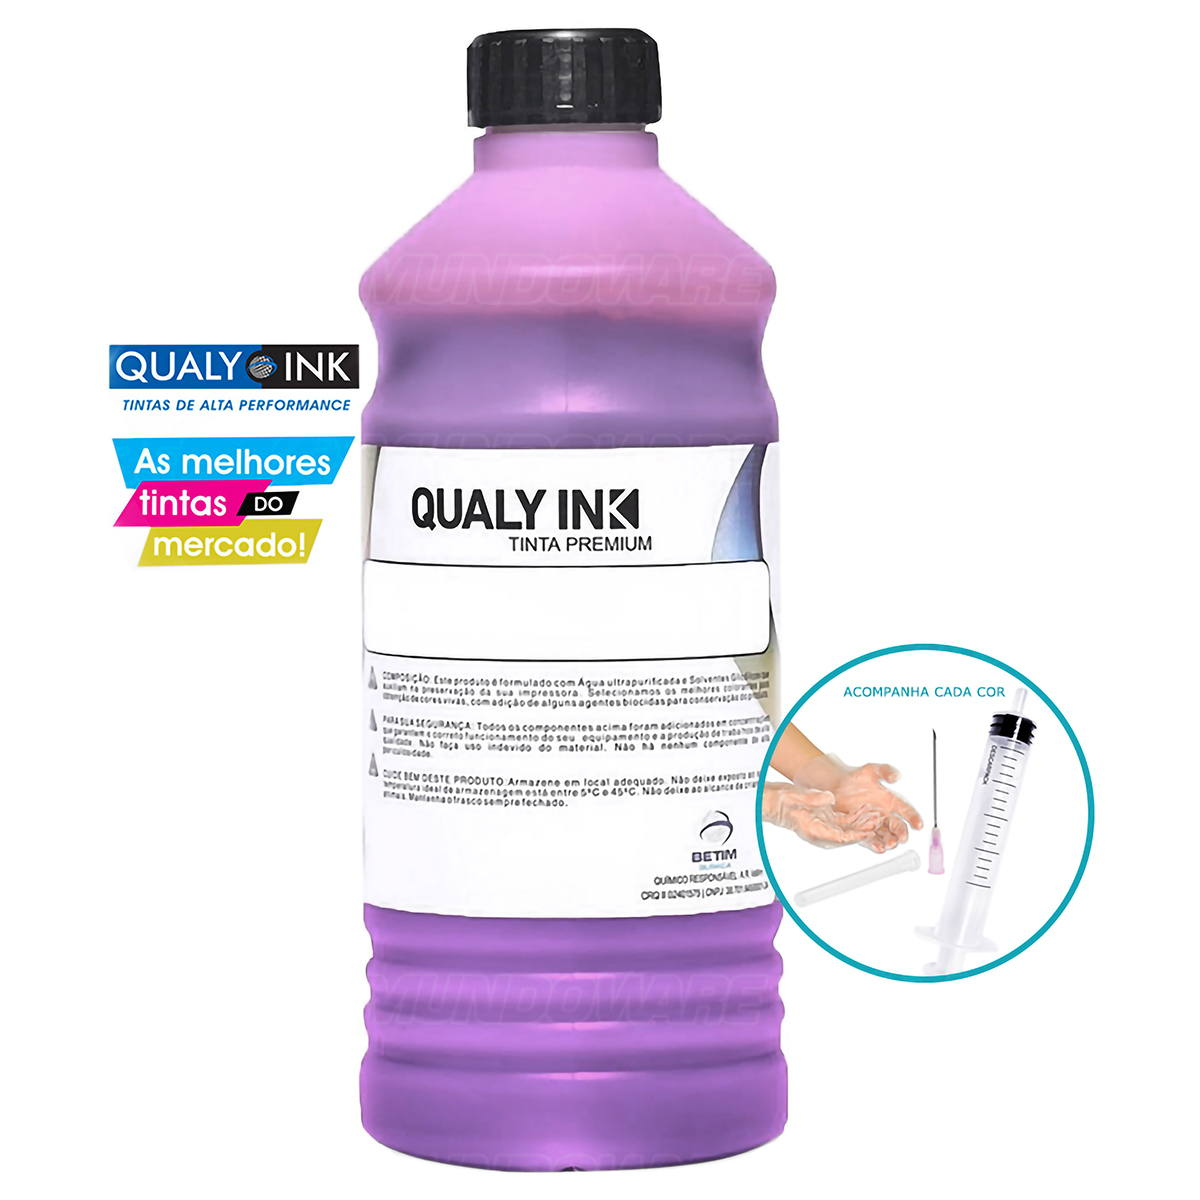 Compatível: Tinta Corante Qualy-Ink LMC3E-1527 Série 673 para Epson L800 L805 L810 L850 L1800 Magenta Light 1L